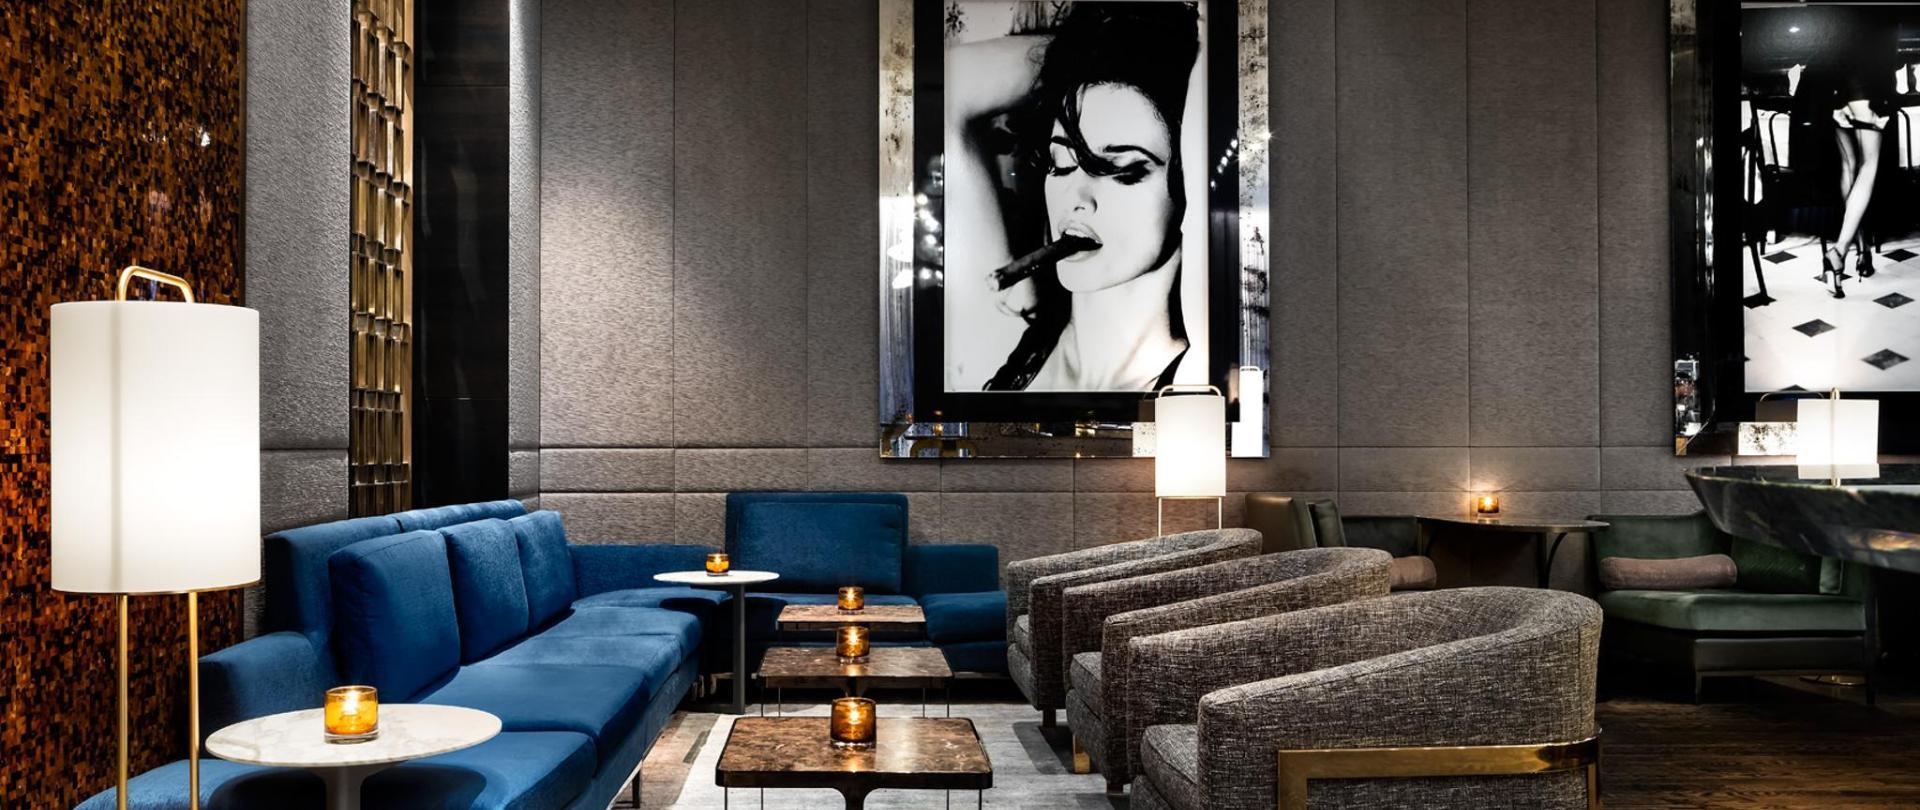 ONE lounge .jpg